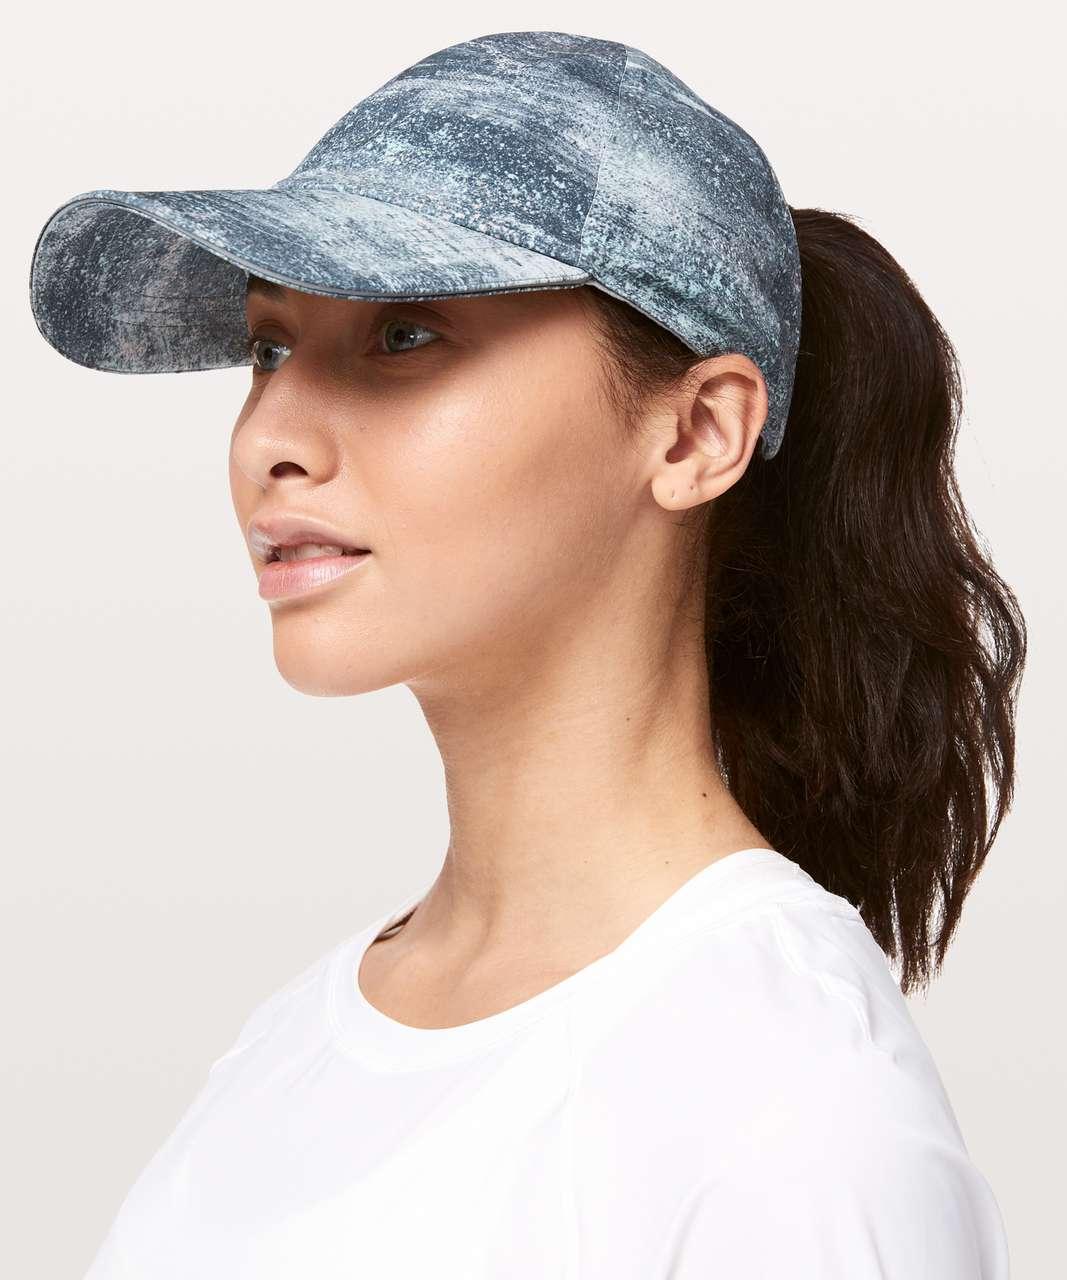 c4f18238 Lululemon Baller Hat Run *Ponytail - Azurite Mint Tint Multi / Blue Cast